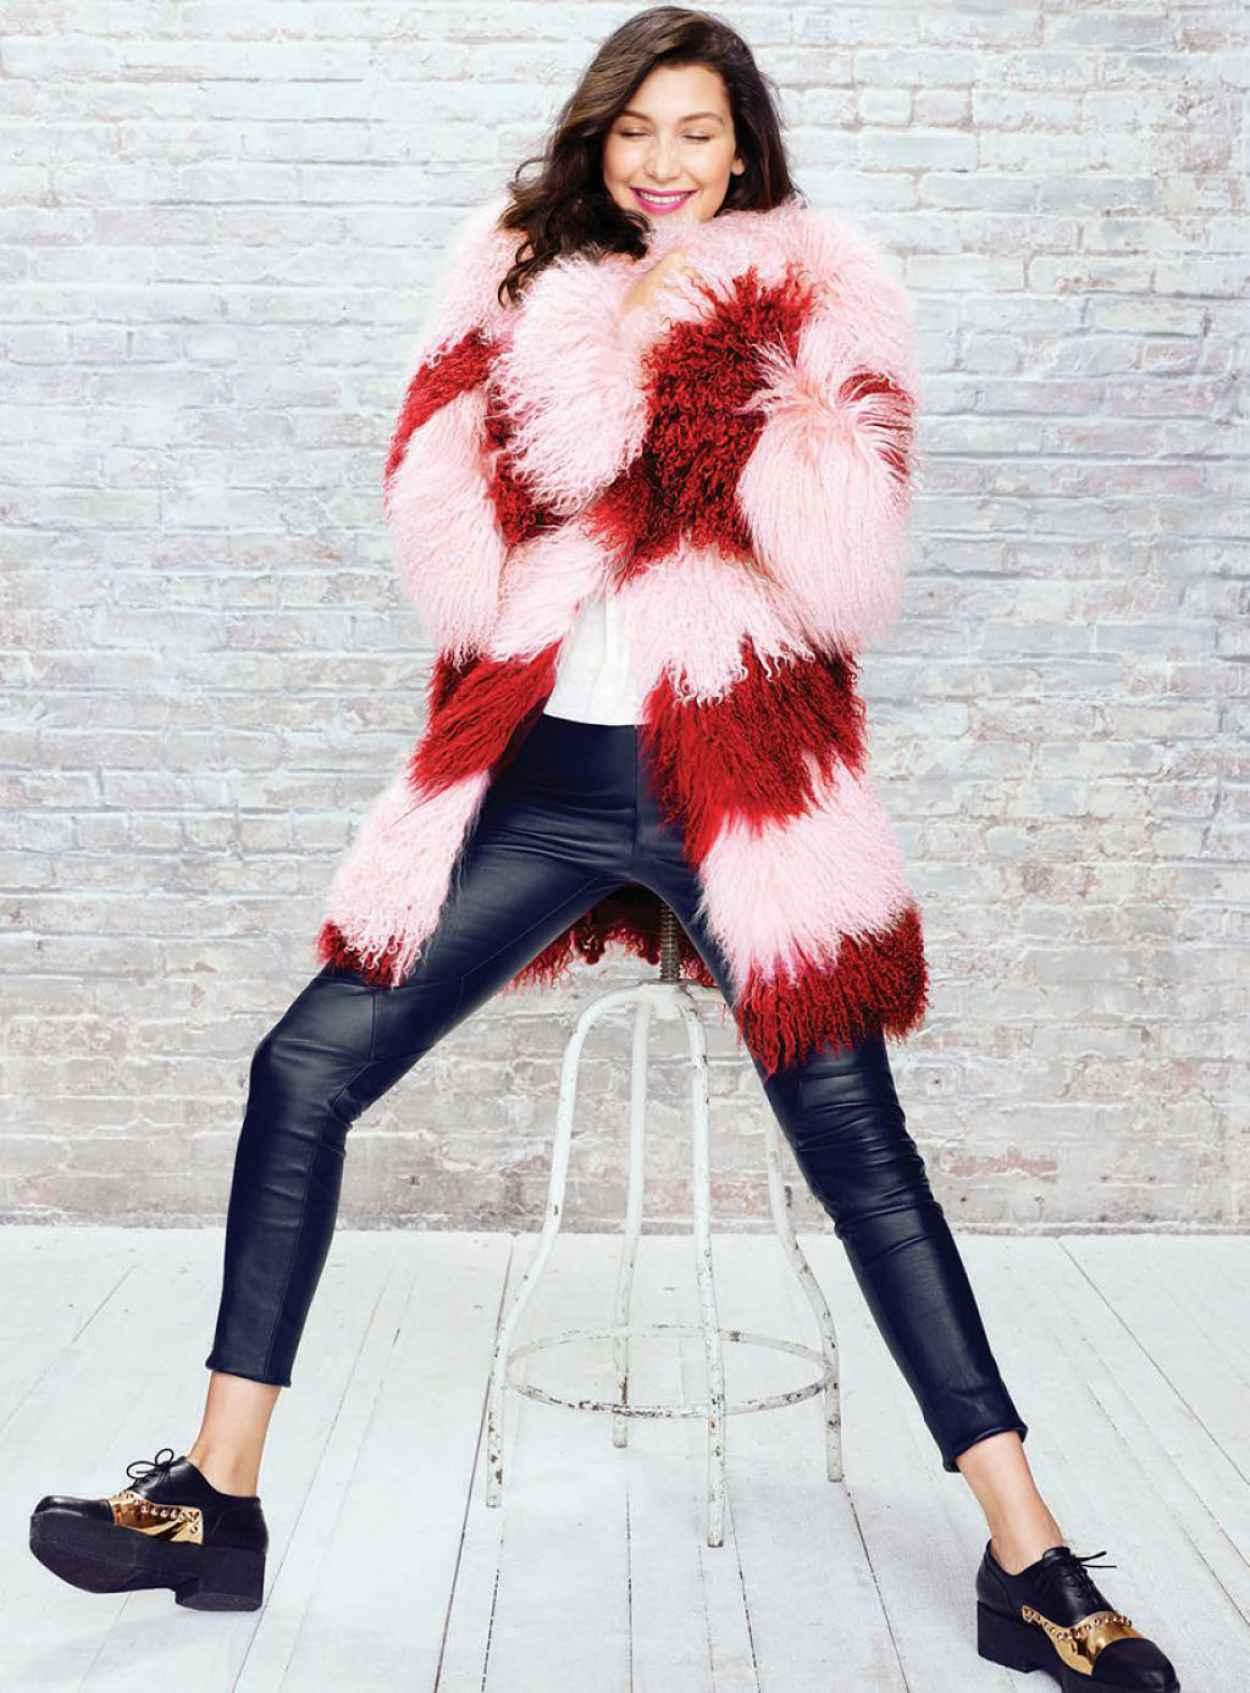 Bella Hadid - Photoshoot for Seventeen Magazine November 2015-3